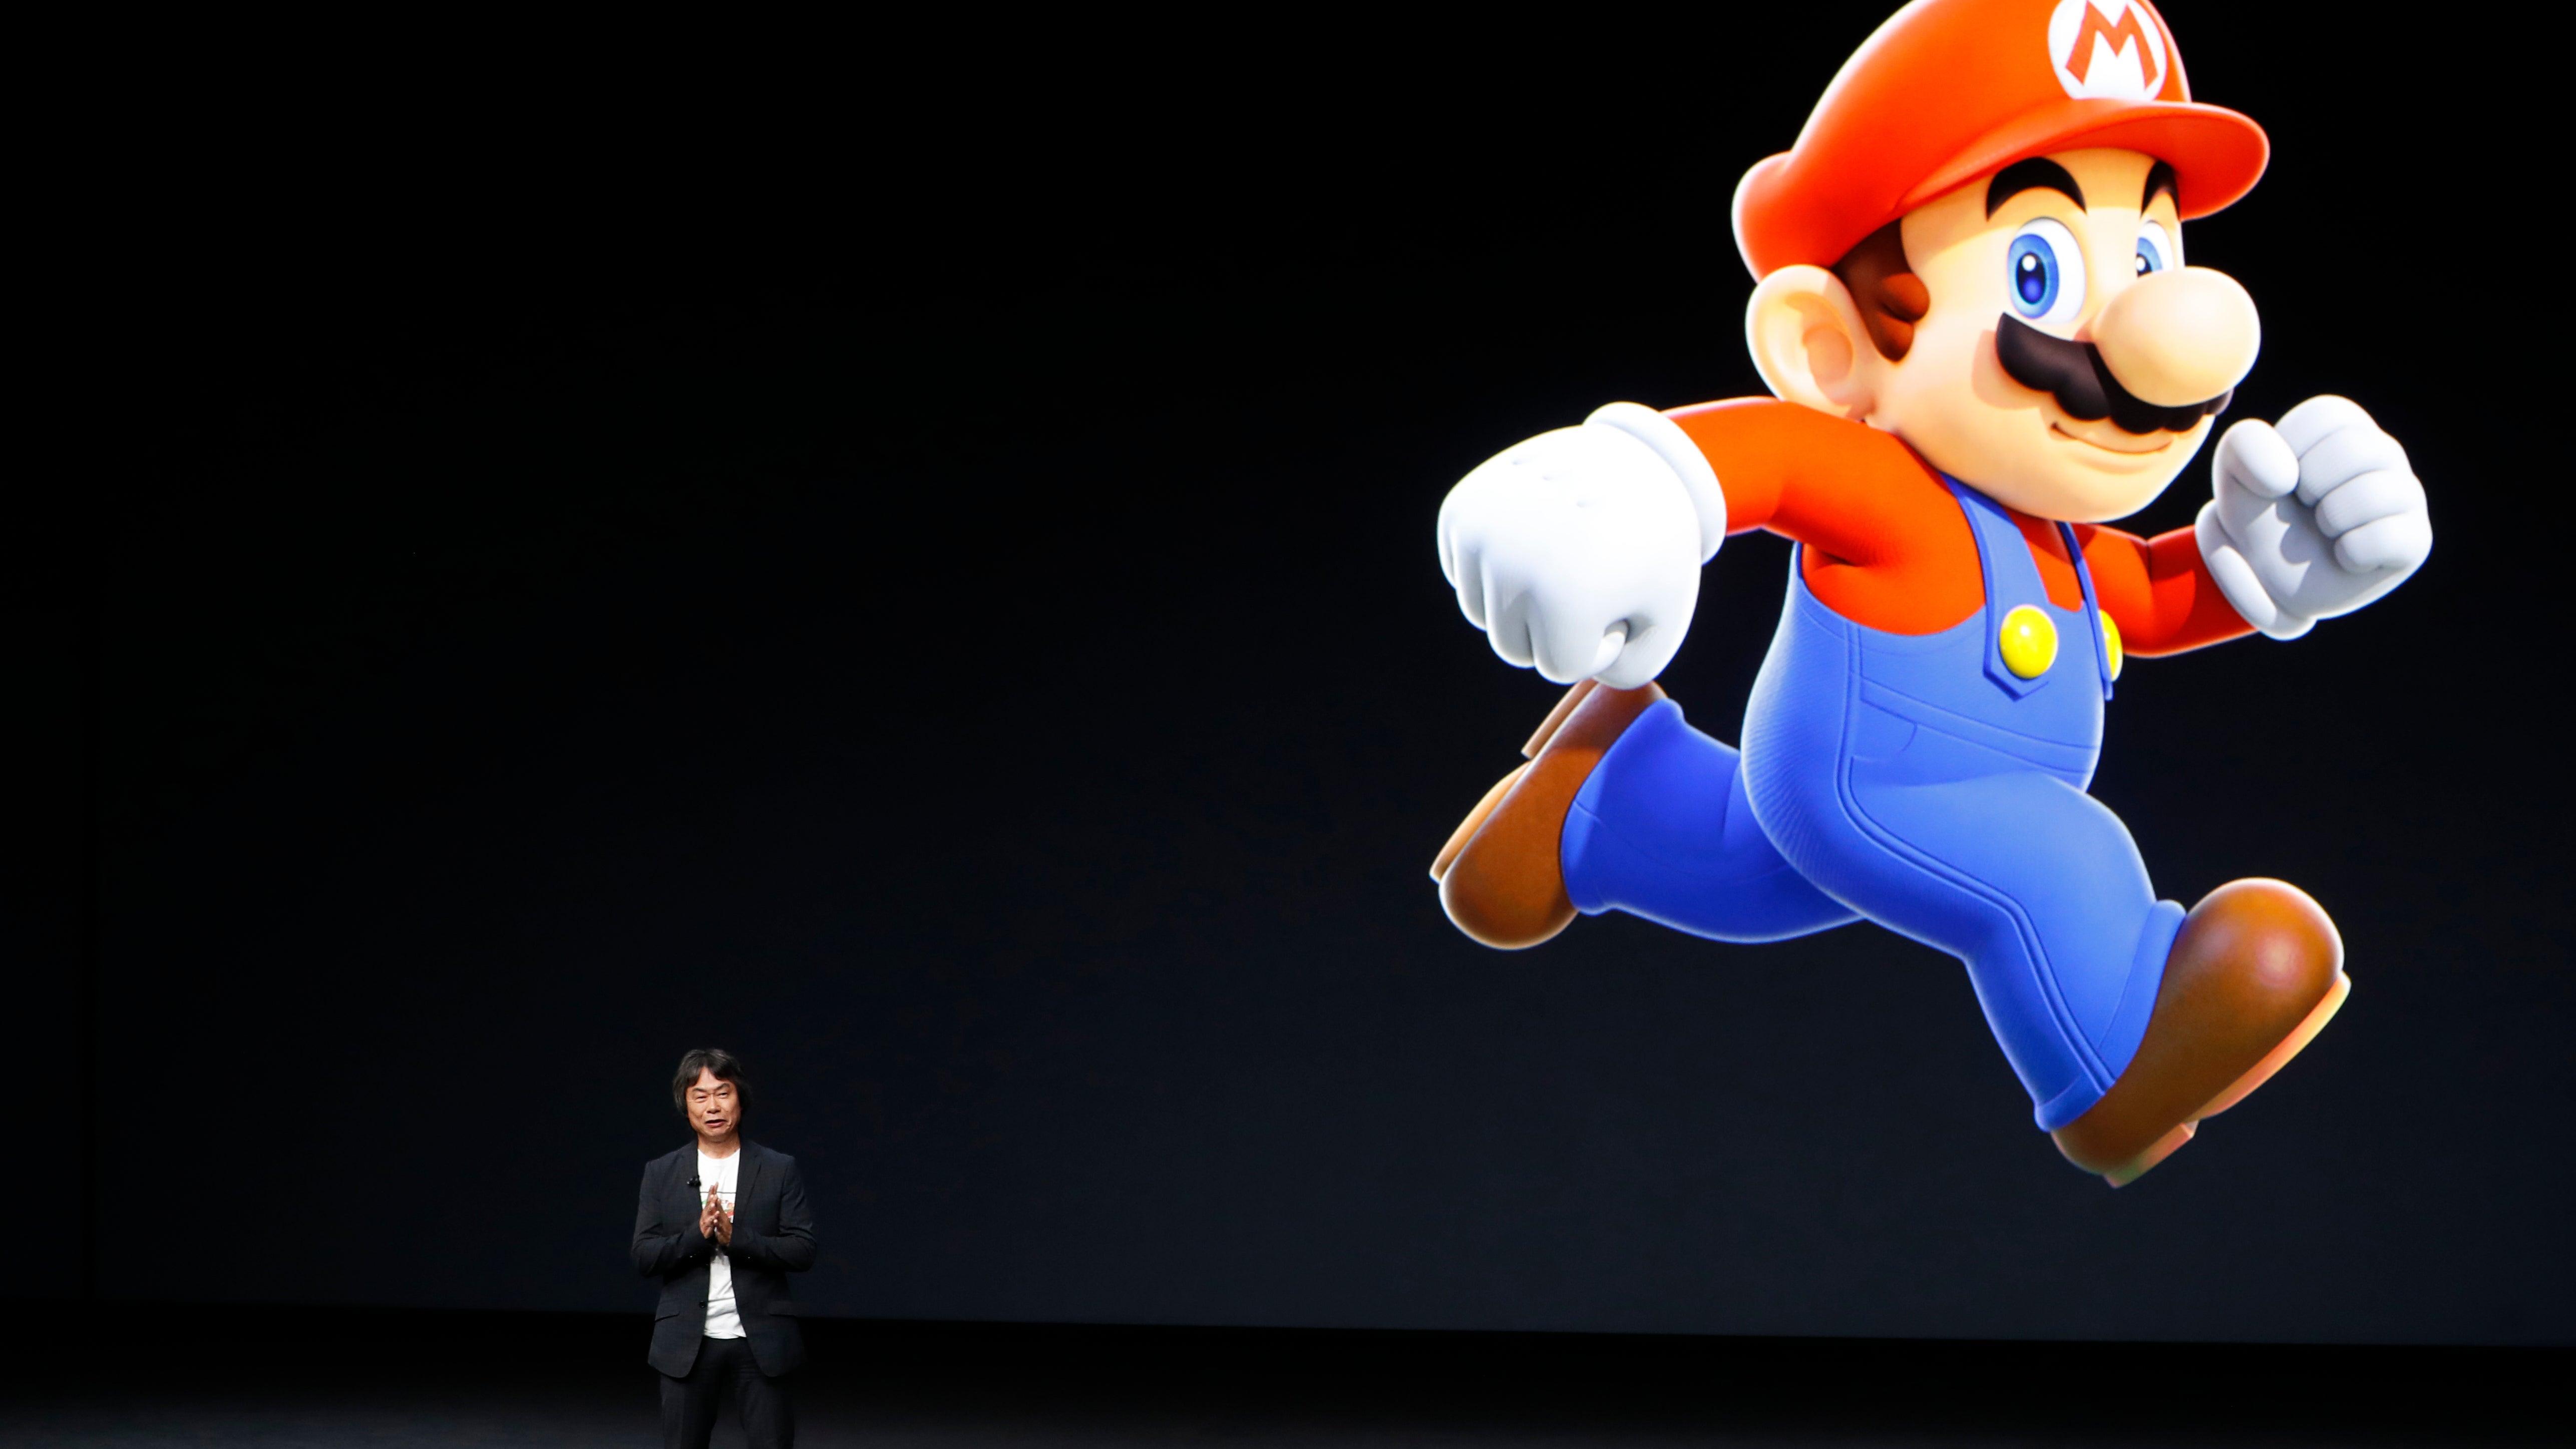 Mario Segale, The Inspiration Behind Nintendo's 'Super Mario,' Dies At 84